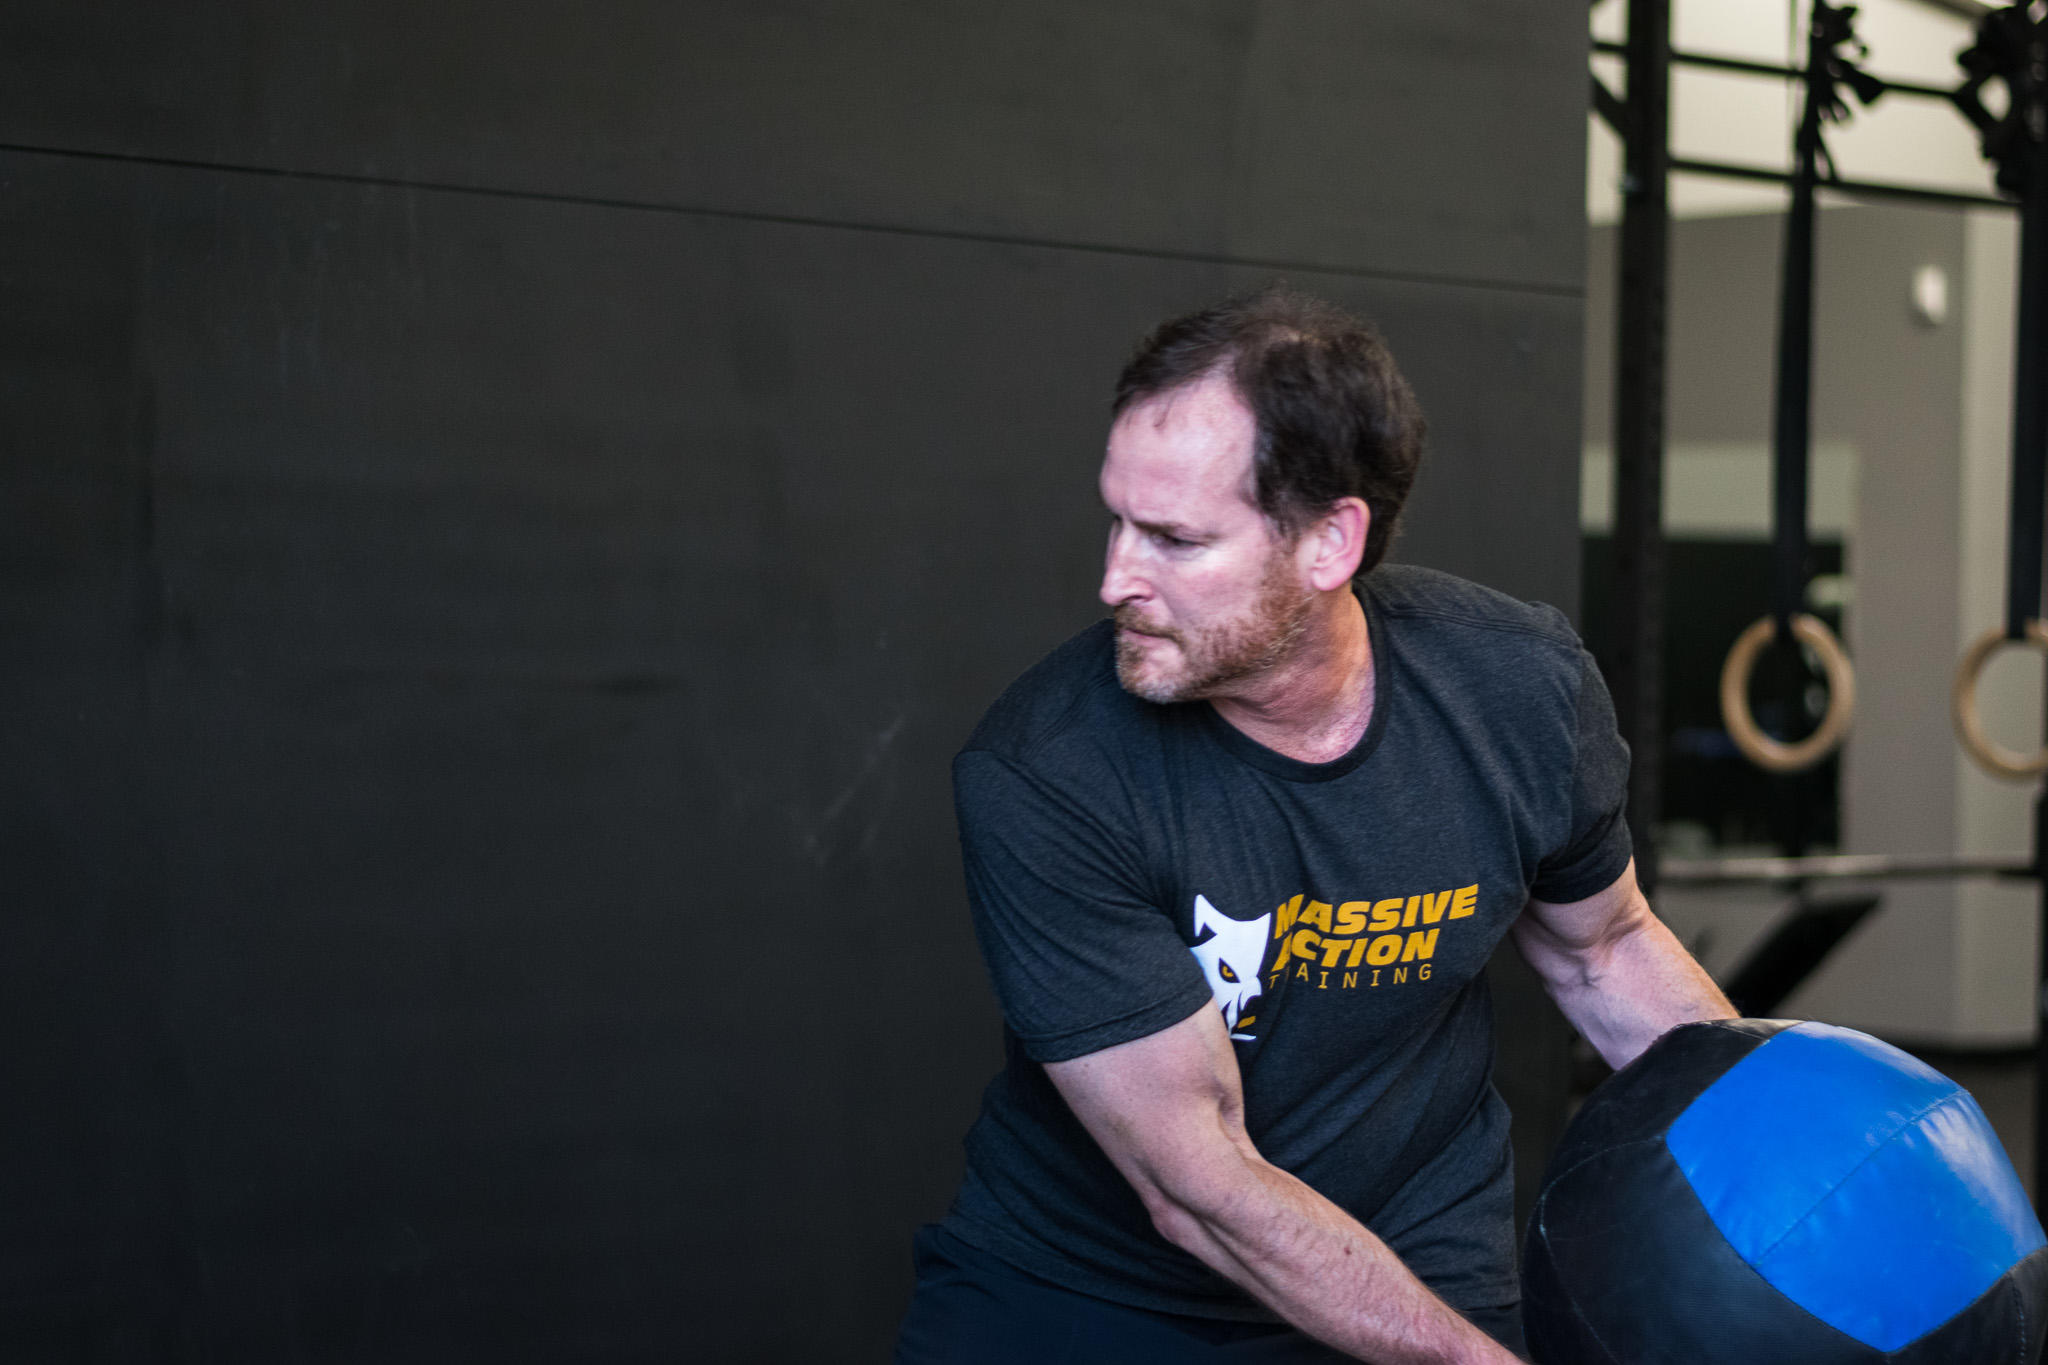 Massive Action Training image 3